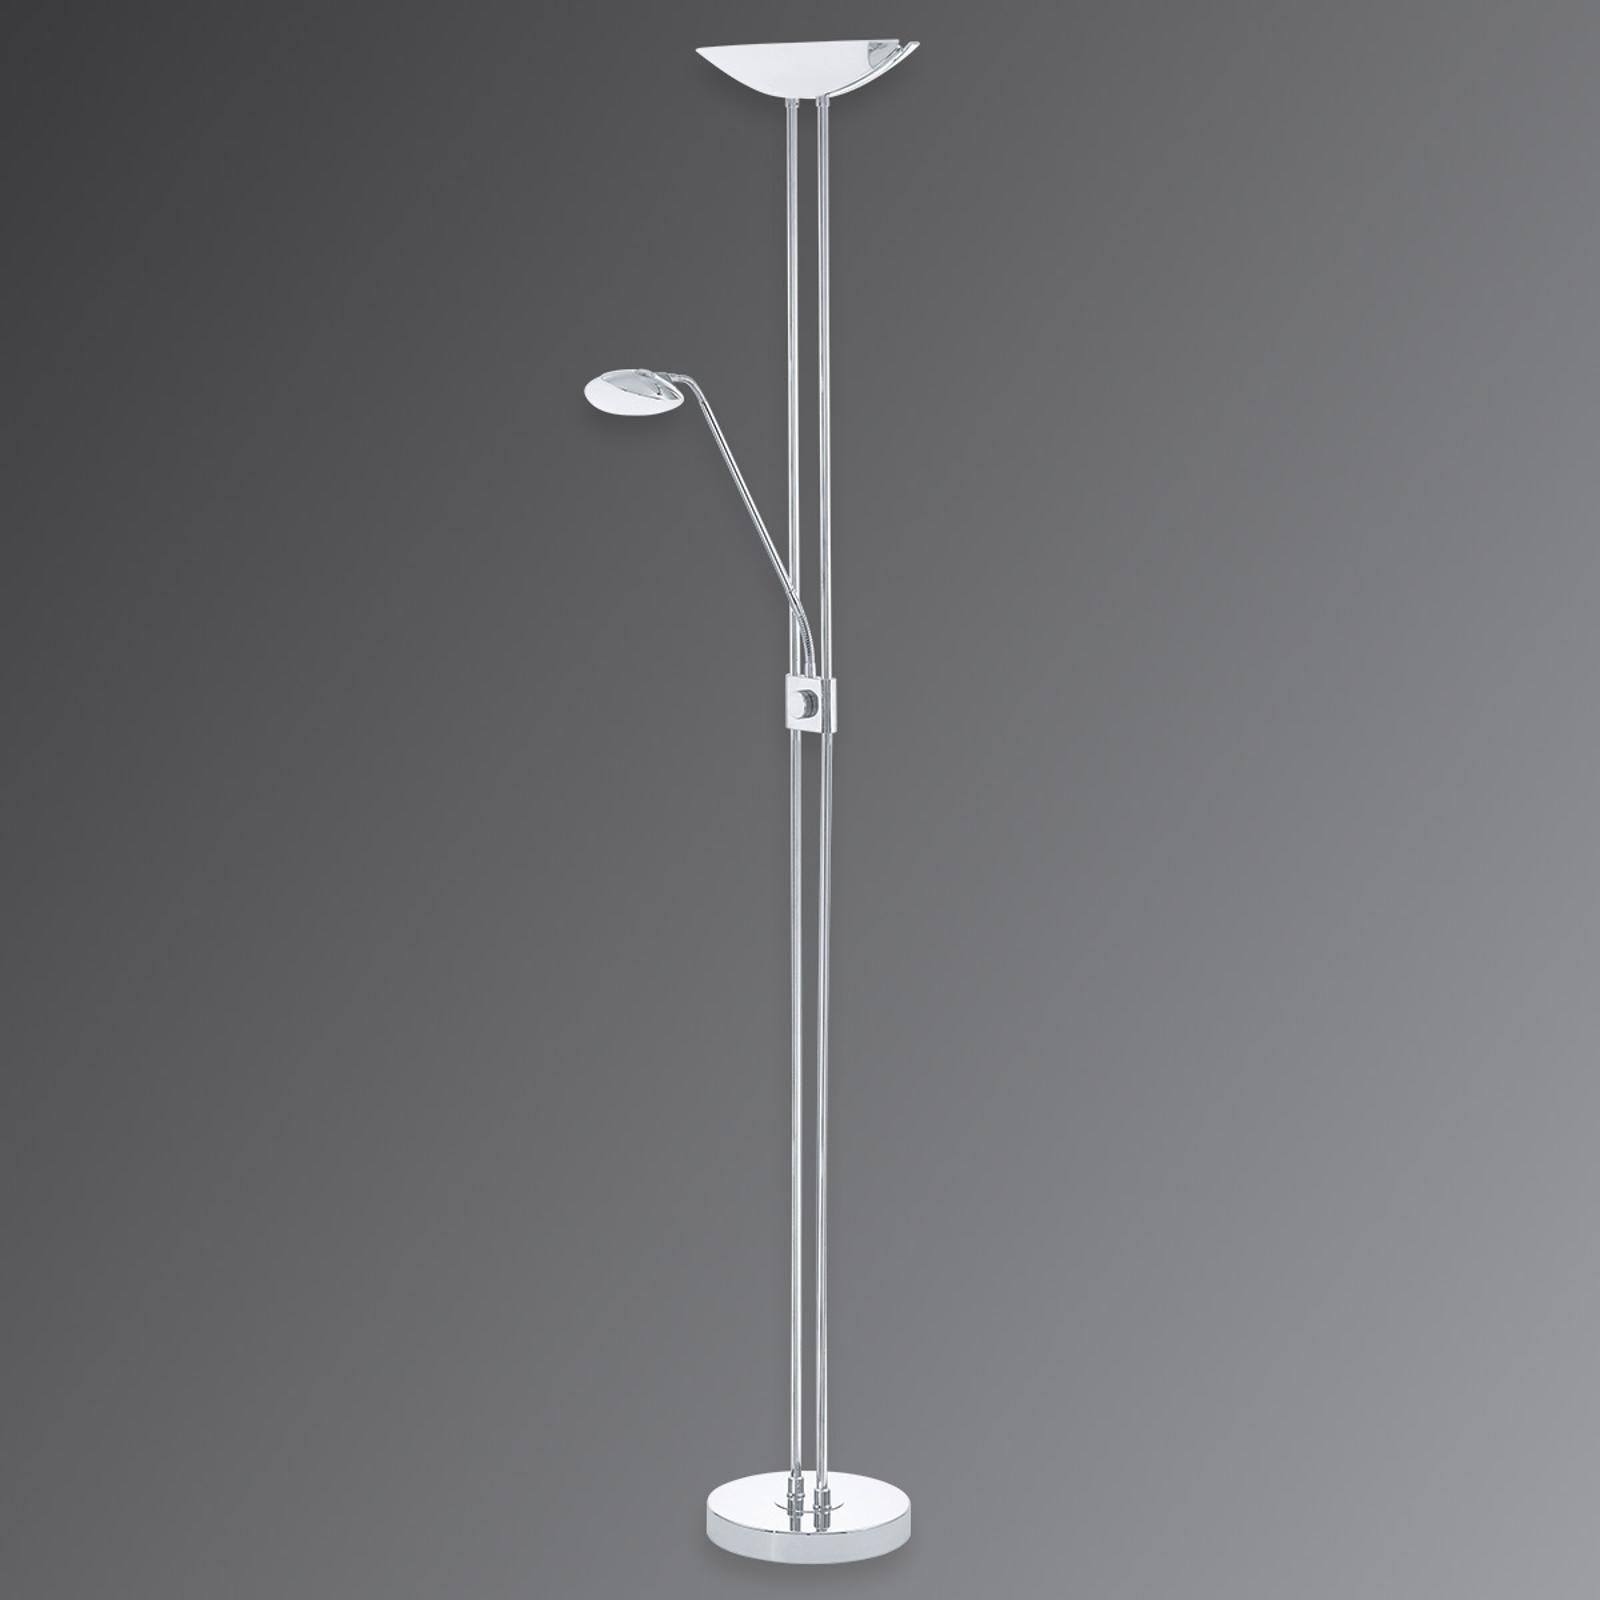 Baya - chrome-plated LED uplighter/reading light_3031767_1